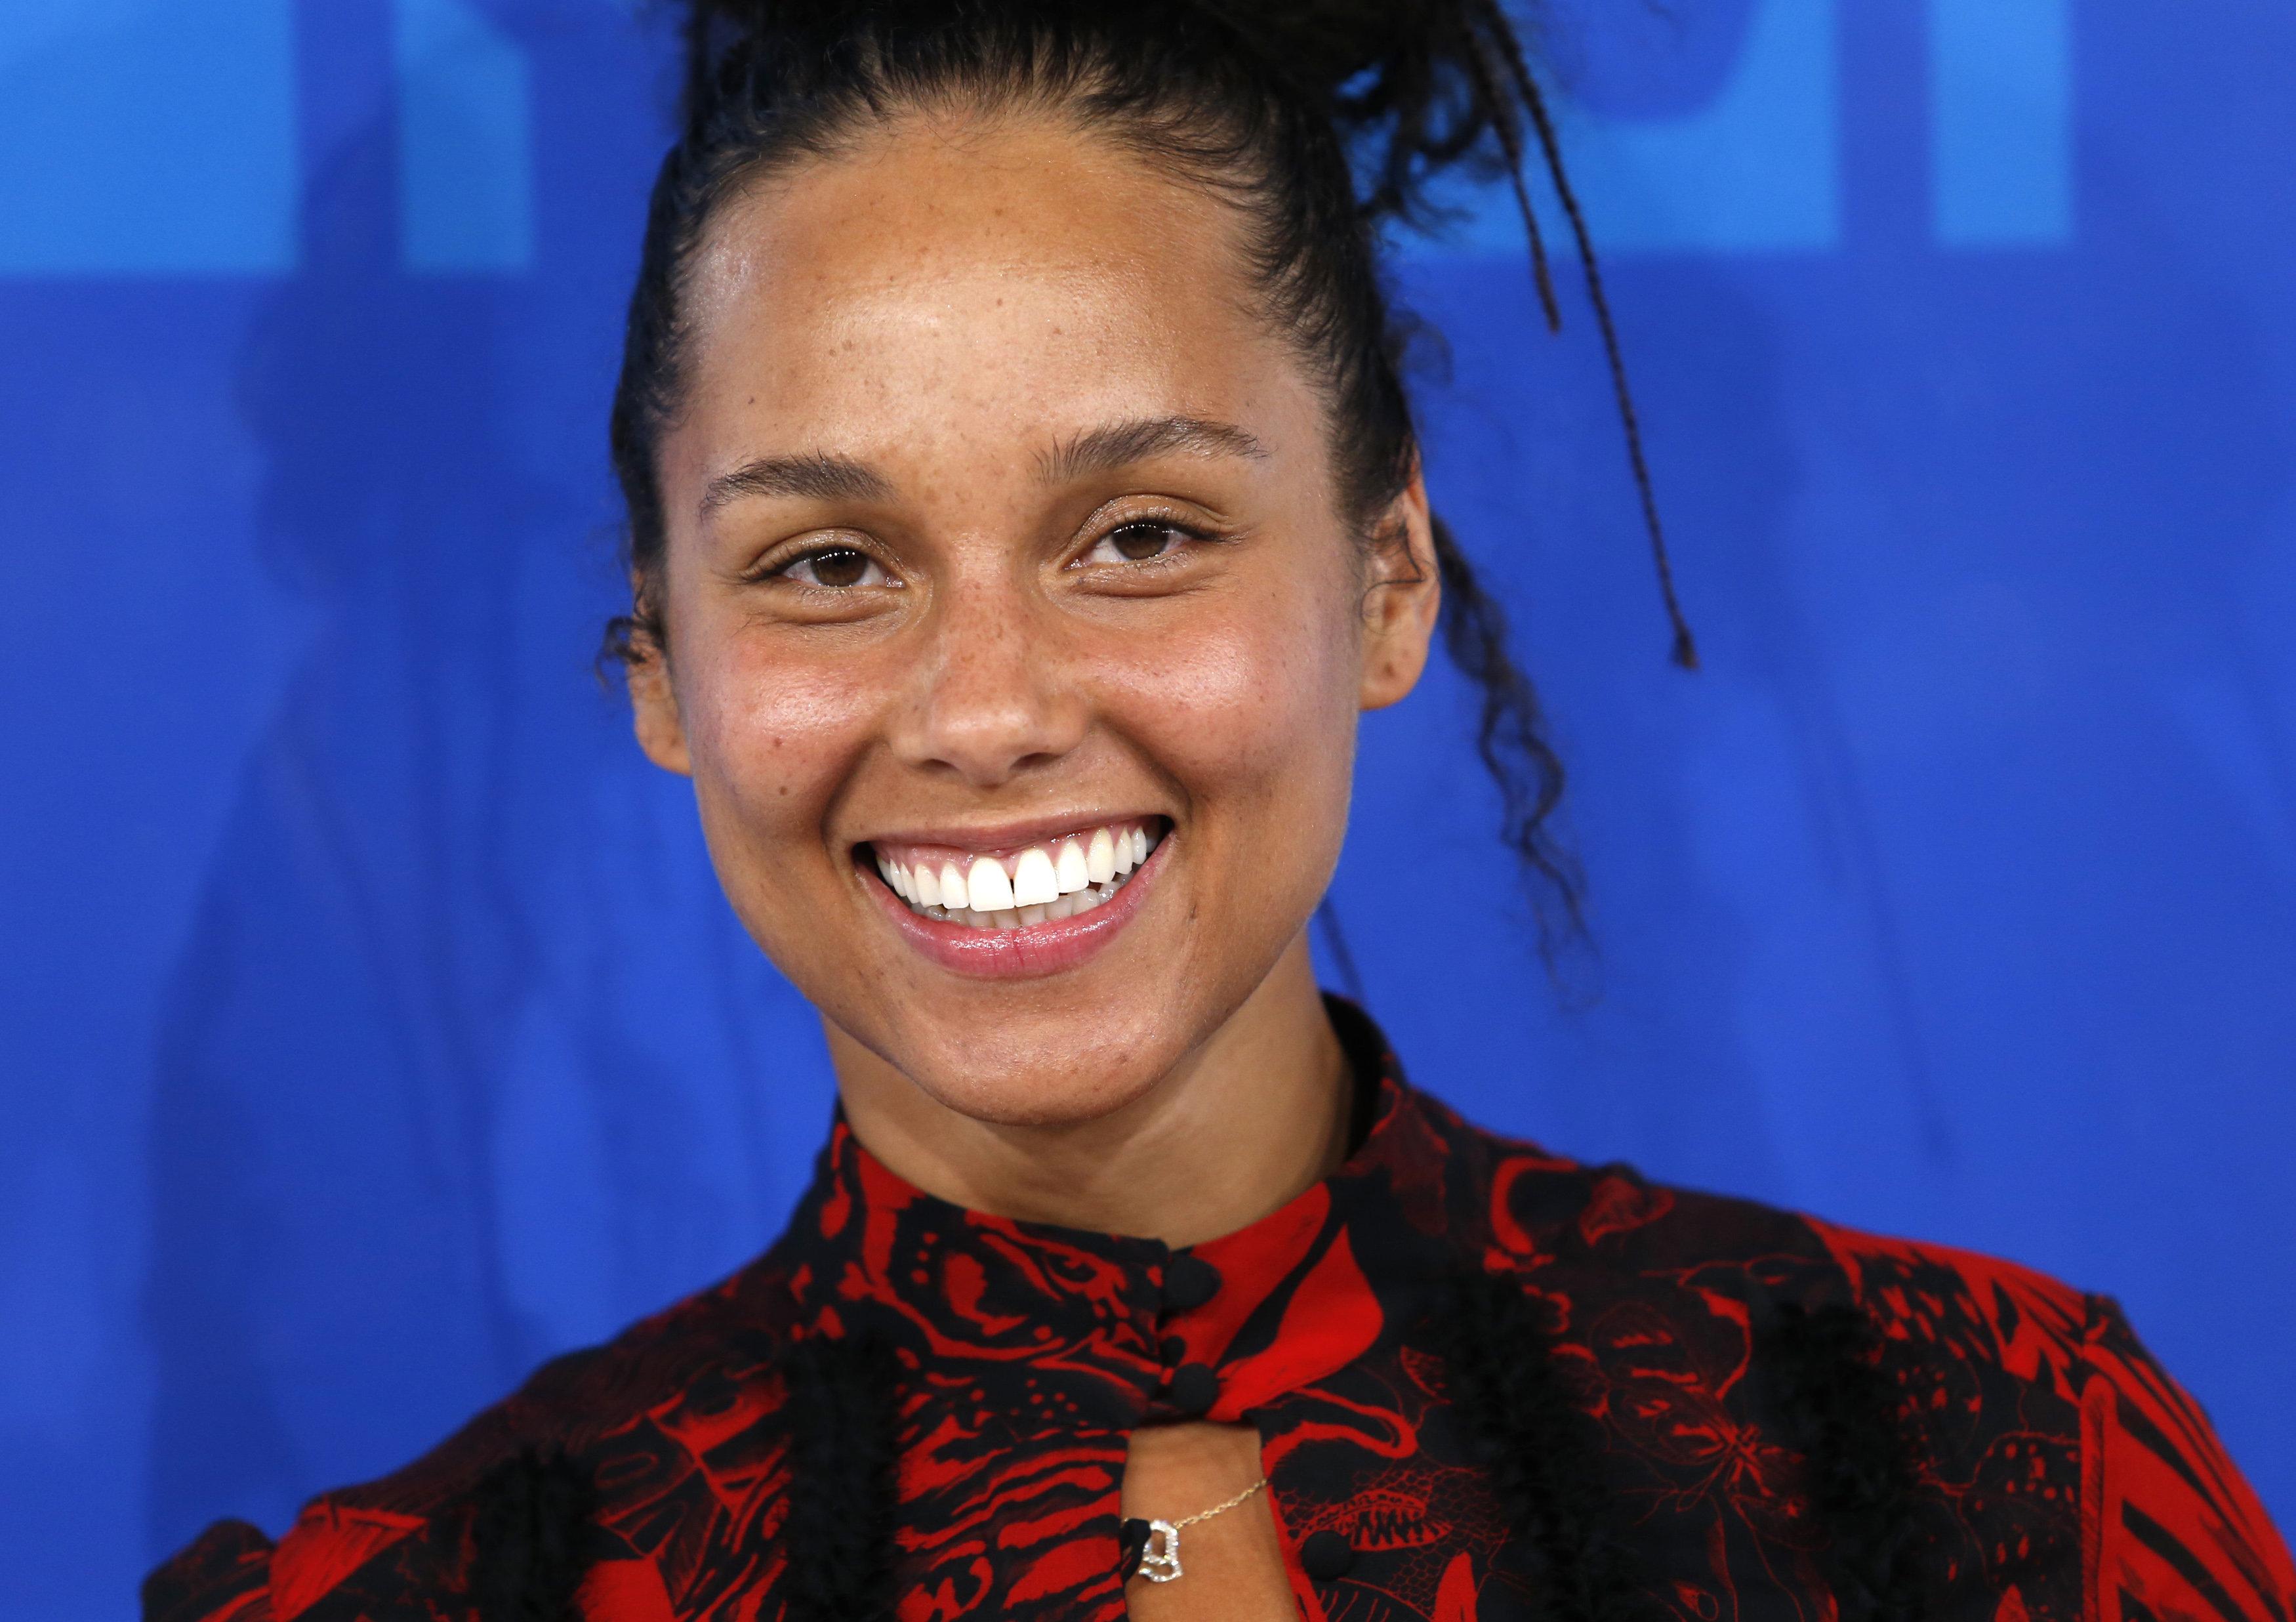 Musician Alicia Keys arrives at the 2016 MTV Video Music Awards in New York, U.S., August 28, 2016.  REUTERS/Eduardo Munoz